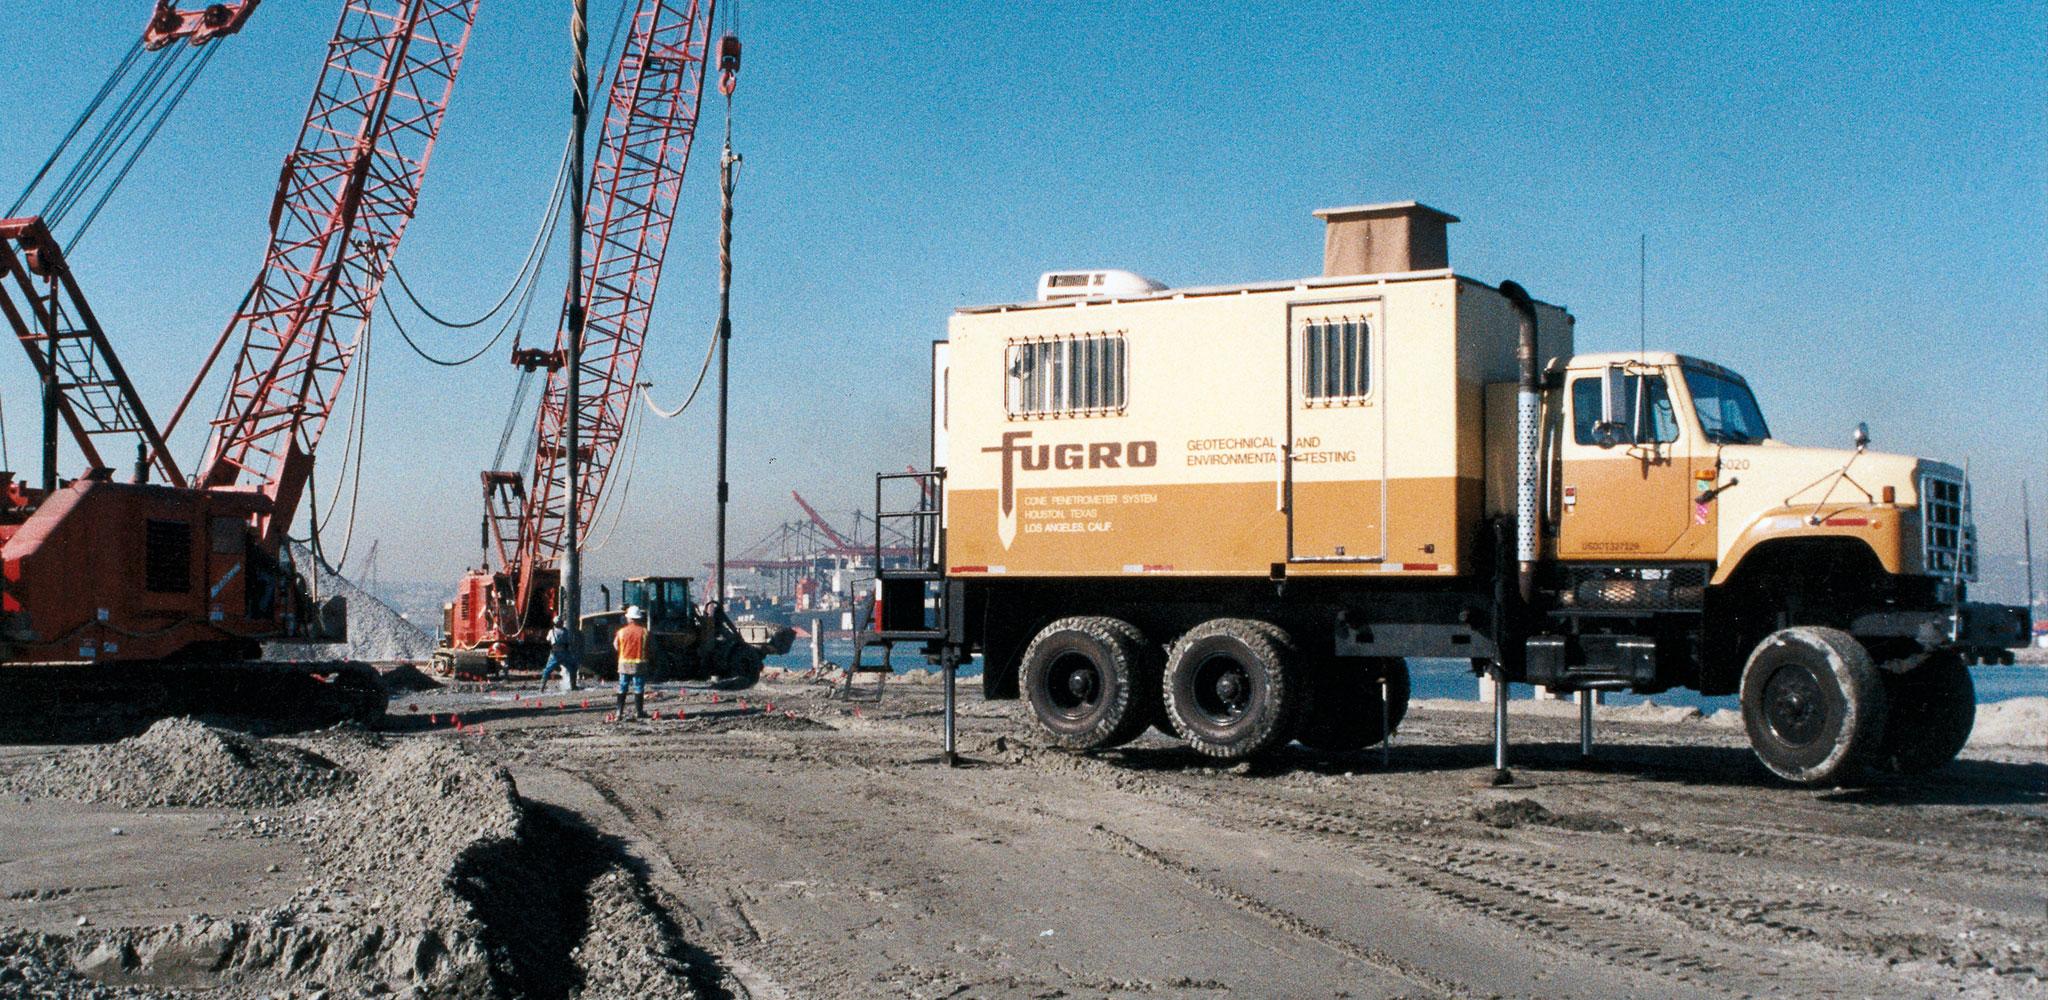 nugen-sellafield-fugro-bravo-topaz-nuclear-project-news-on-uk-power